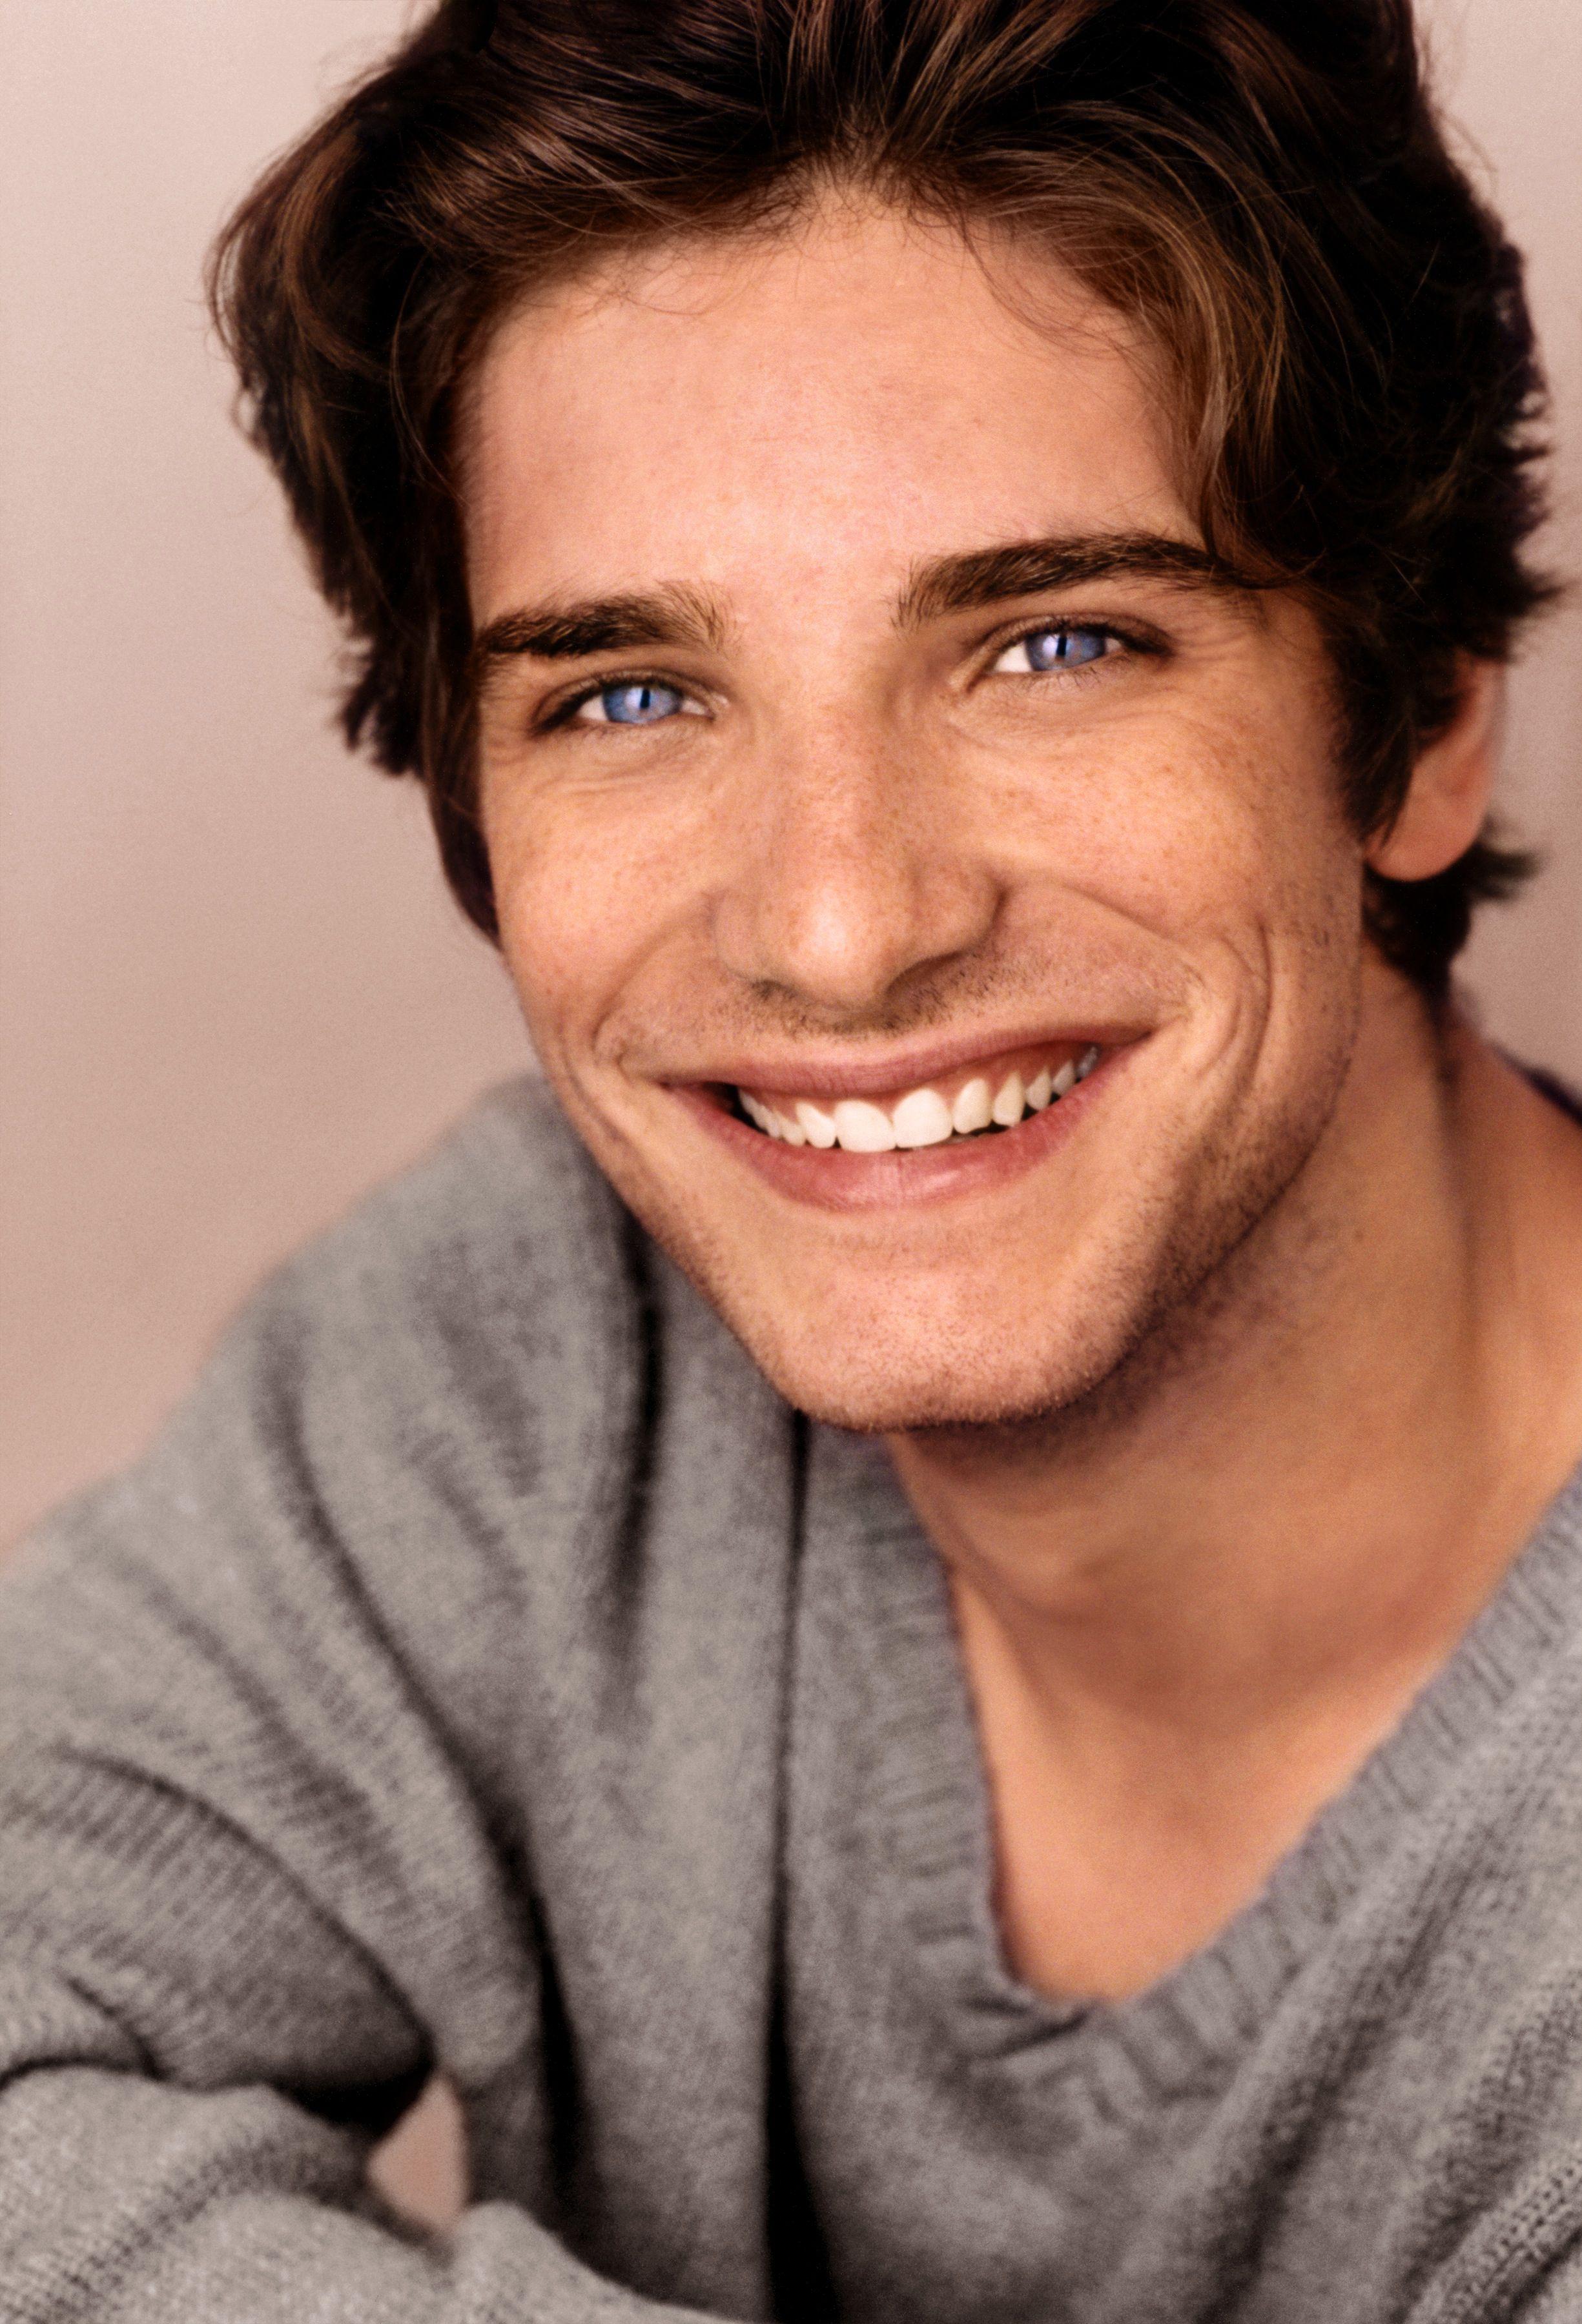 Susan Shacter Latest News Dark Hair Blue Eyes Character Inspiration Male Brown Hair And Grey Eyes